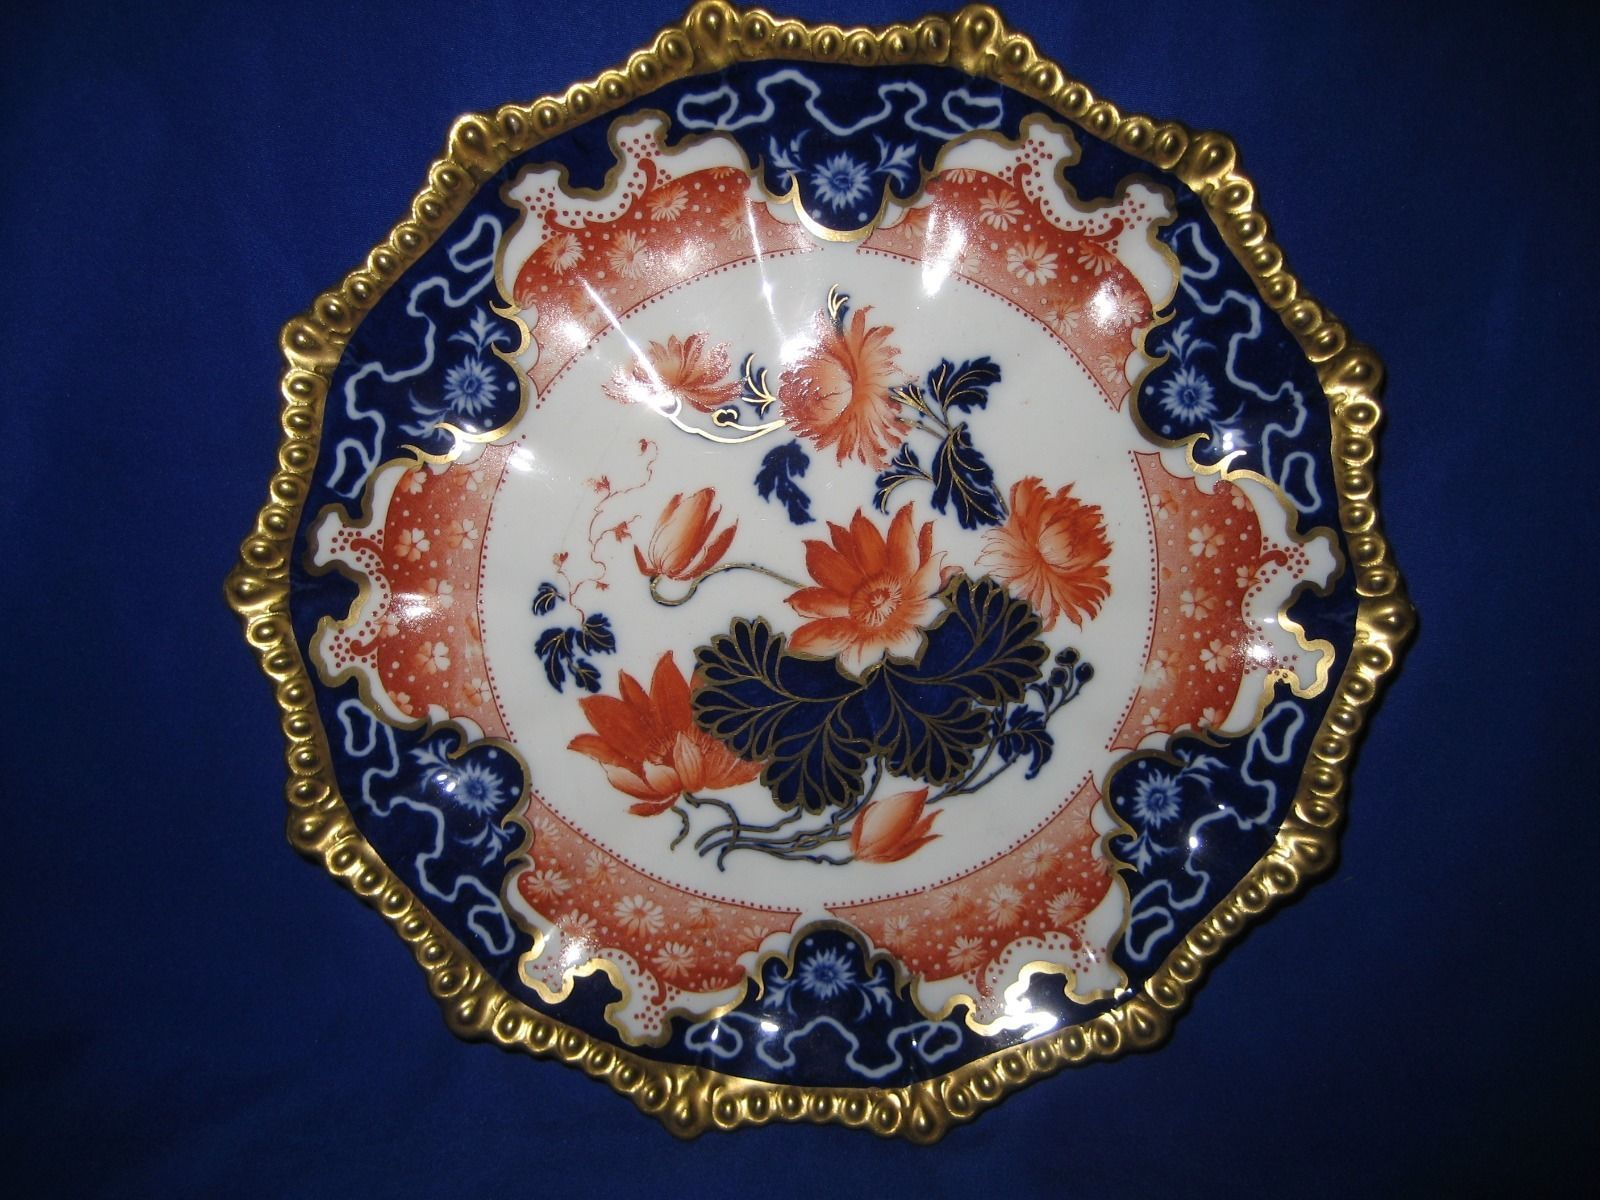 Antique Aynsley Imari Gilt Cabinet Plate | eBay